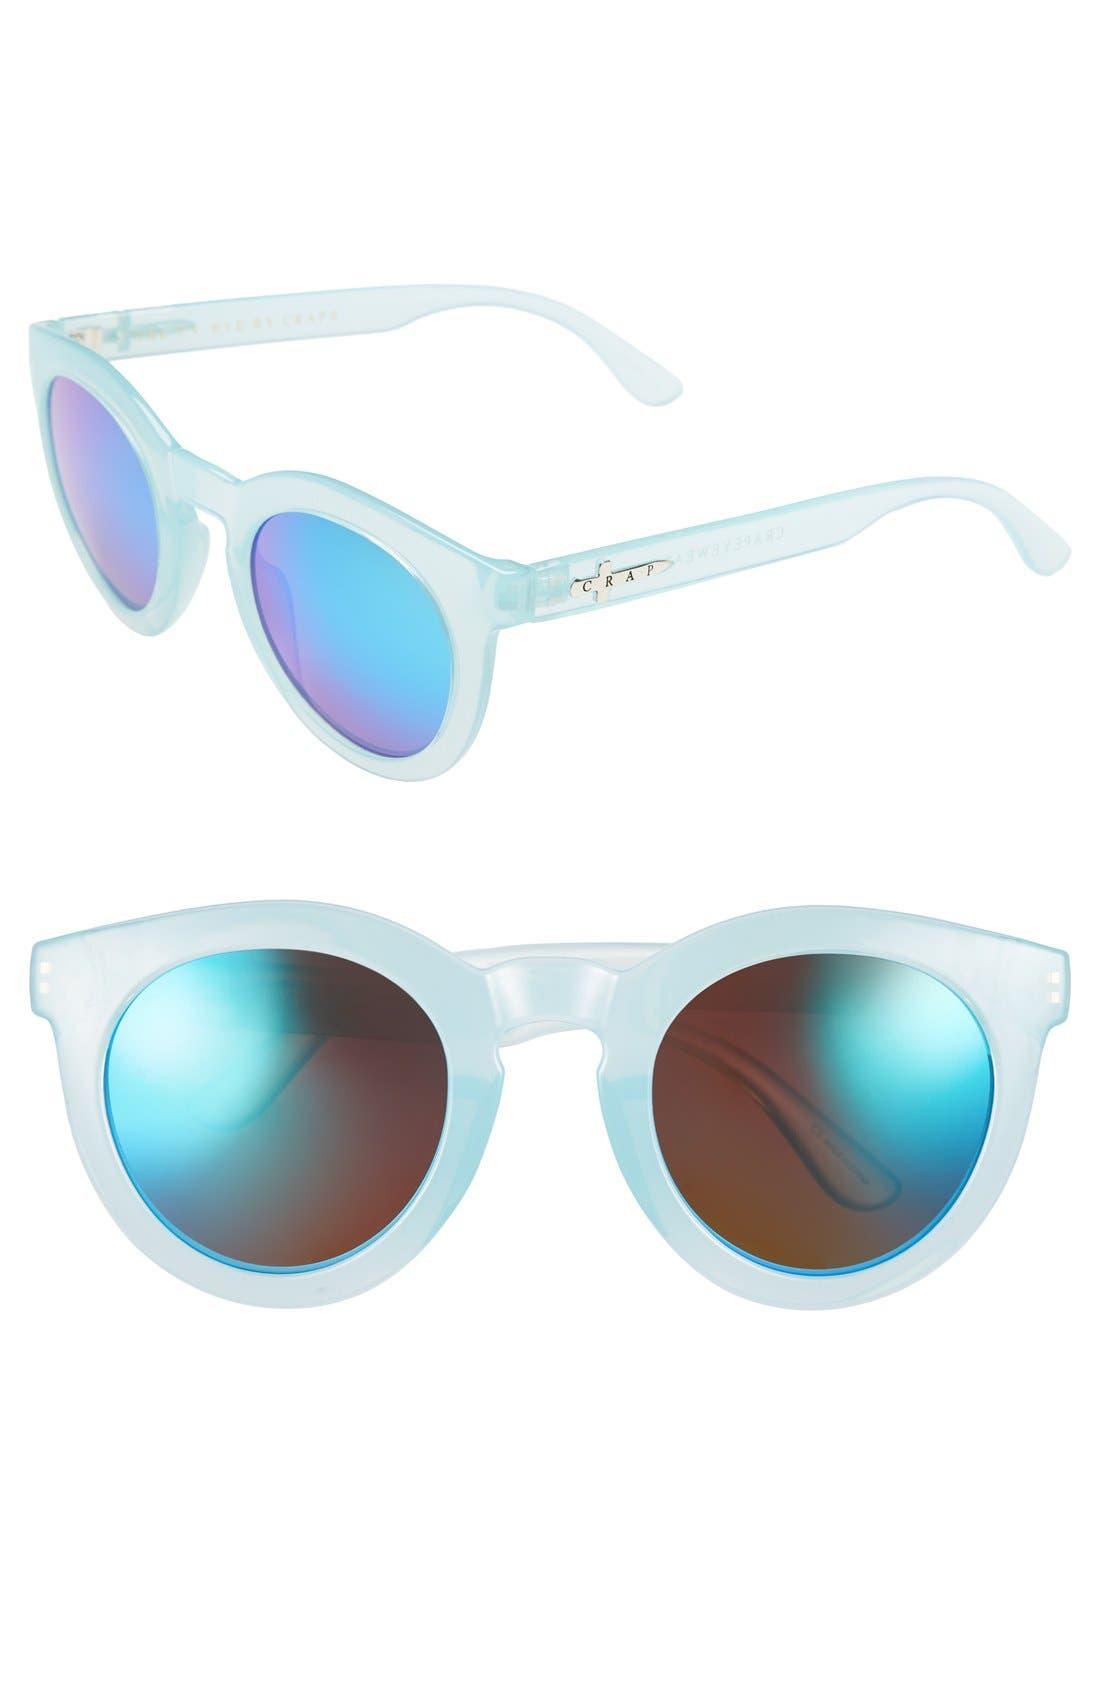 Alternate Image 1 Selected - CRAP Eyewear 'The T.V. Eye' 55mm Sunglasses